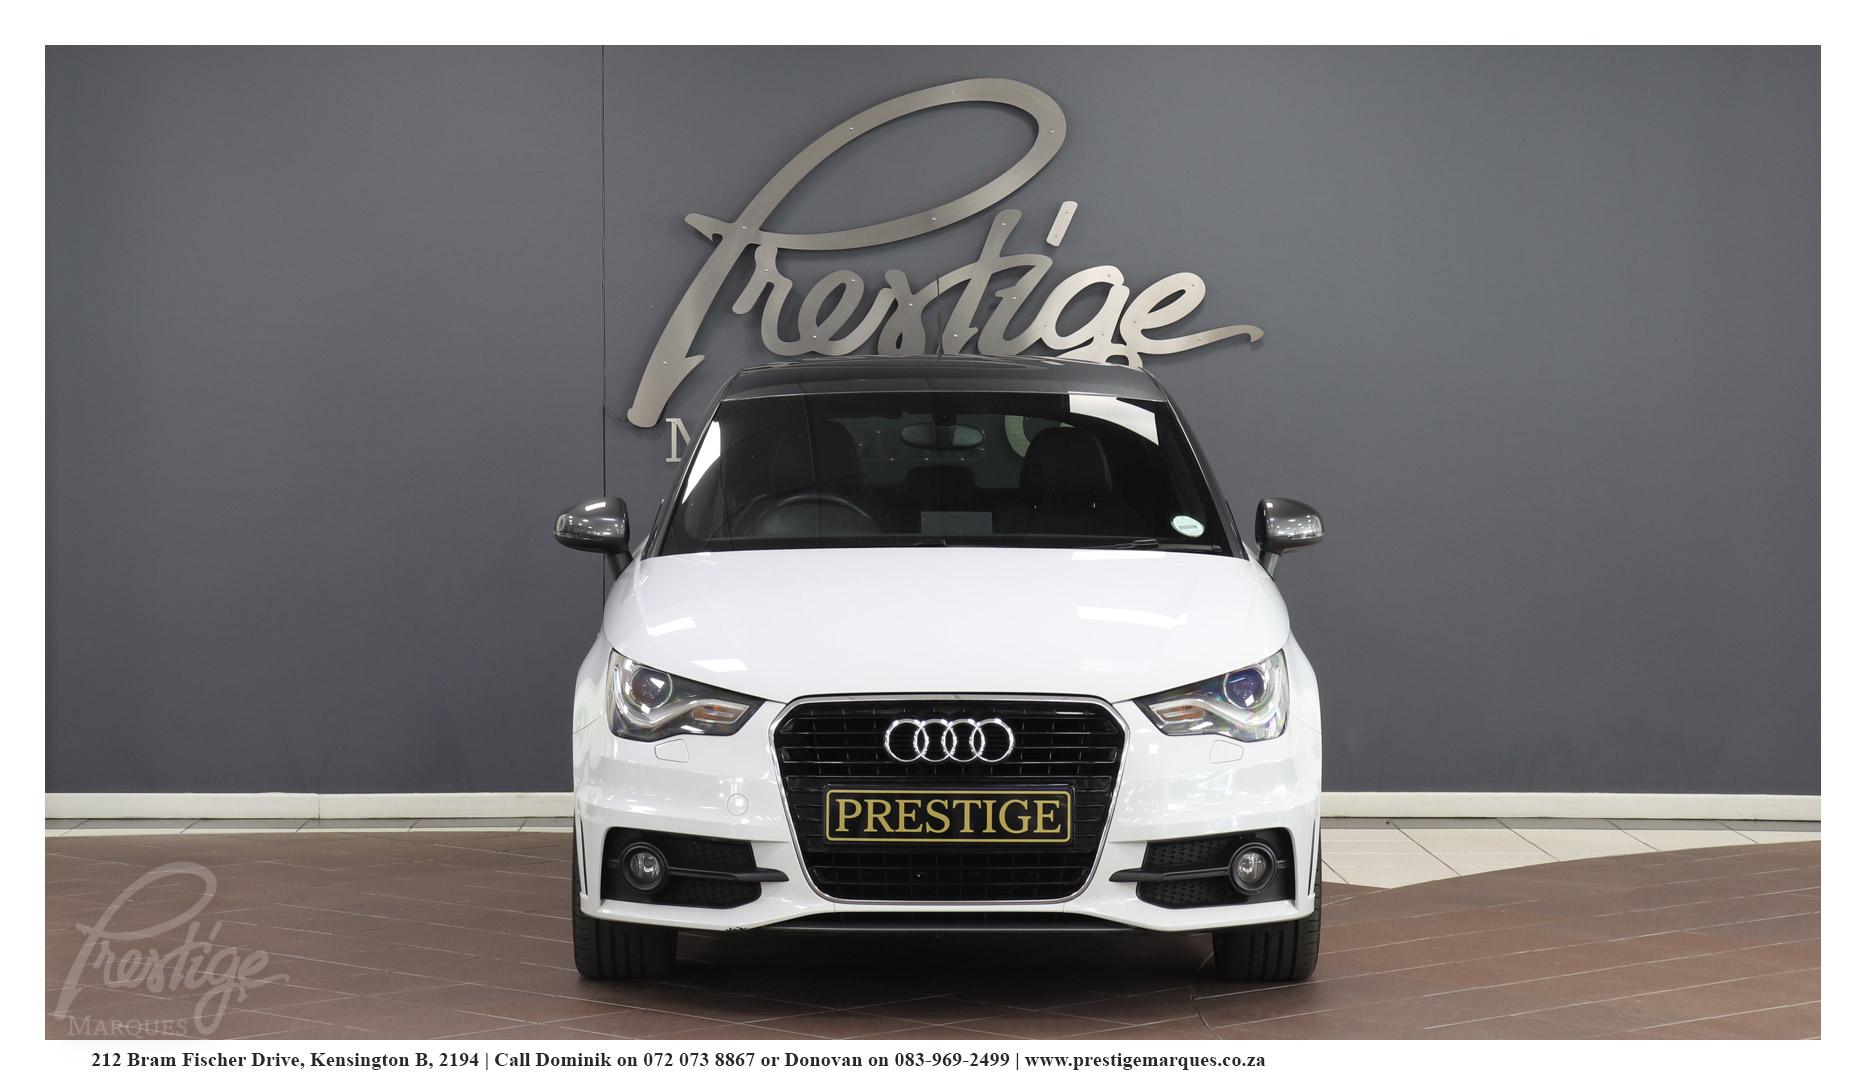 2012-Audi-A1-TFsi-STronic-Sline-Sportbackl-Prestige-Marques-Randburg-Sandton-9